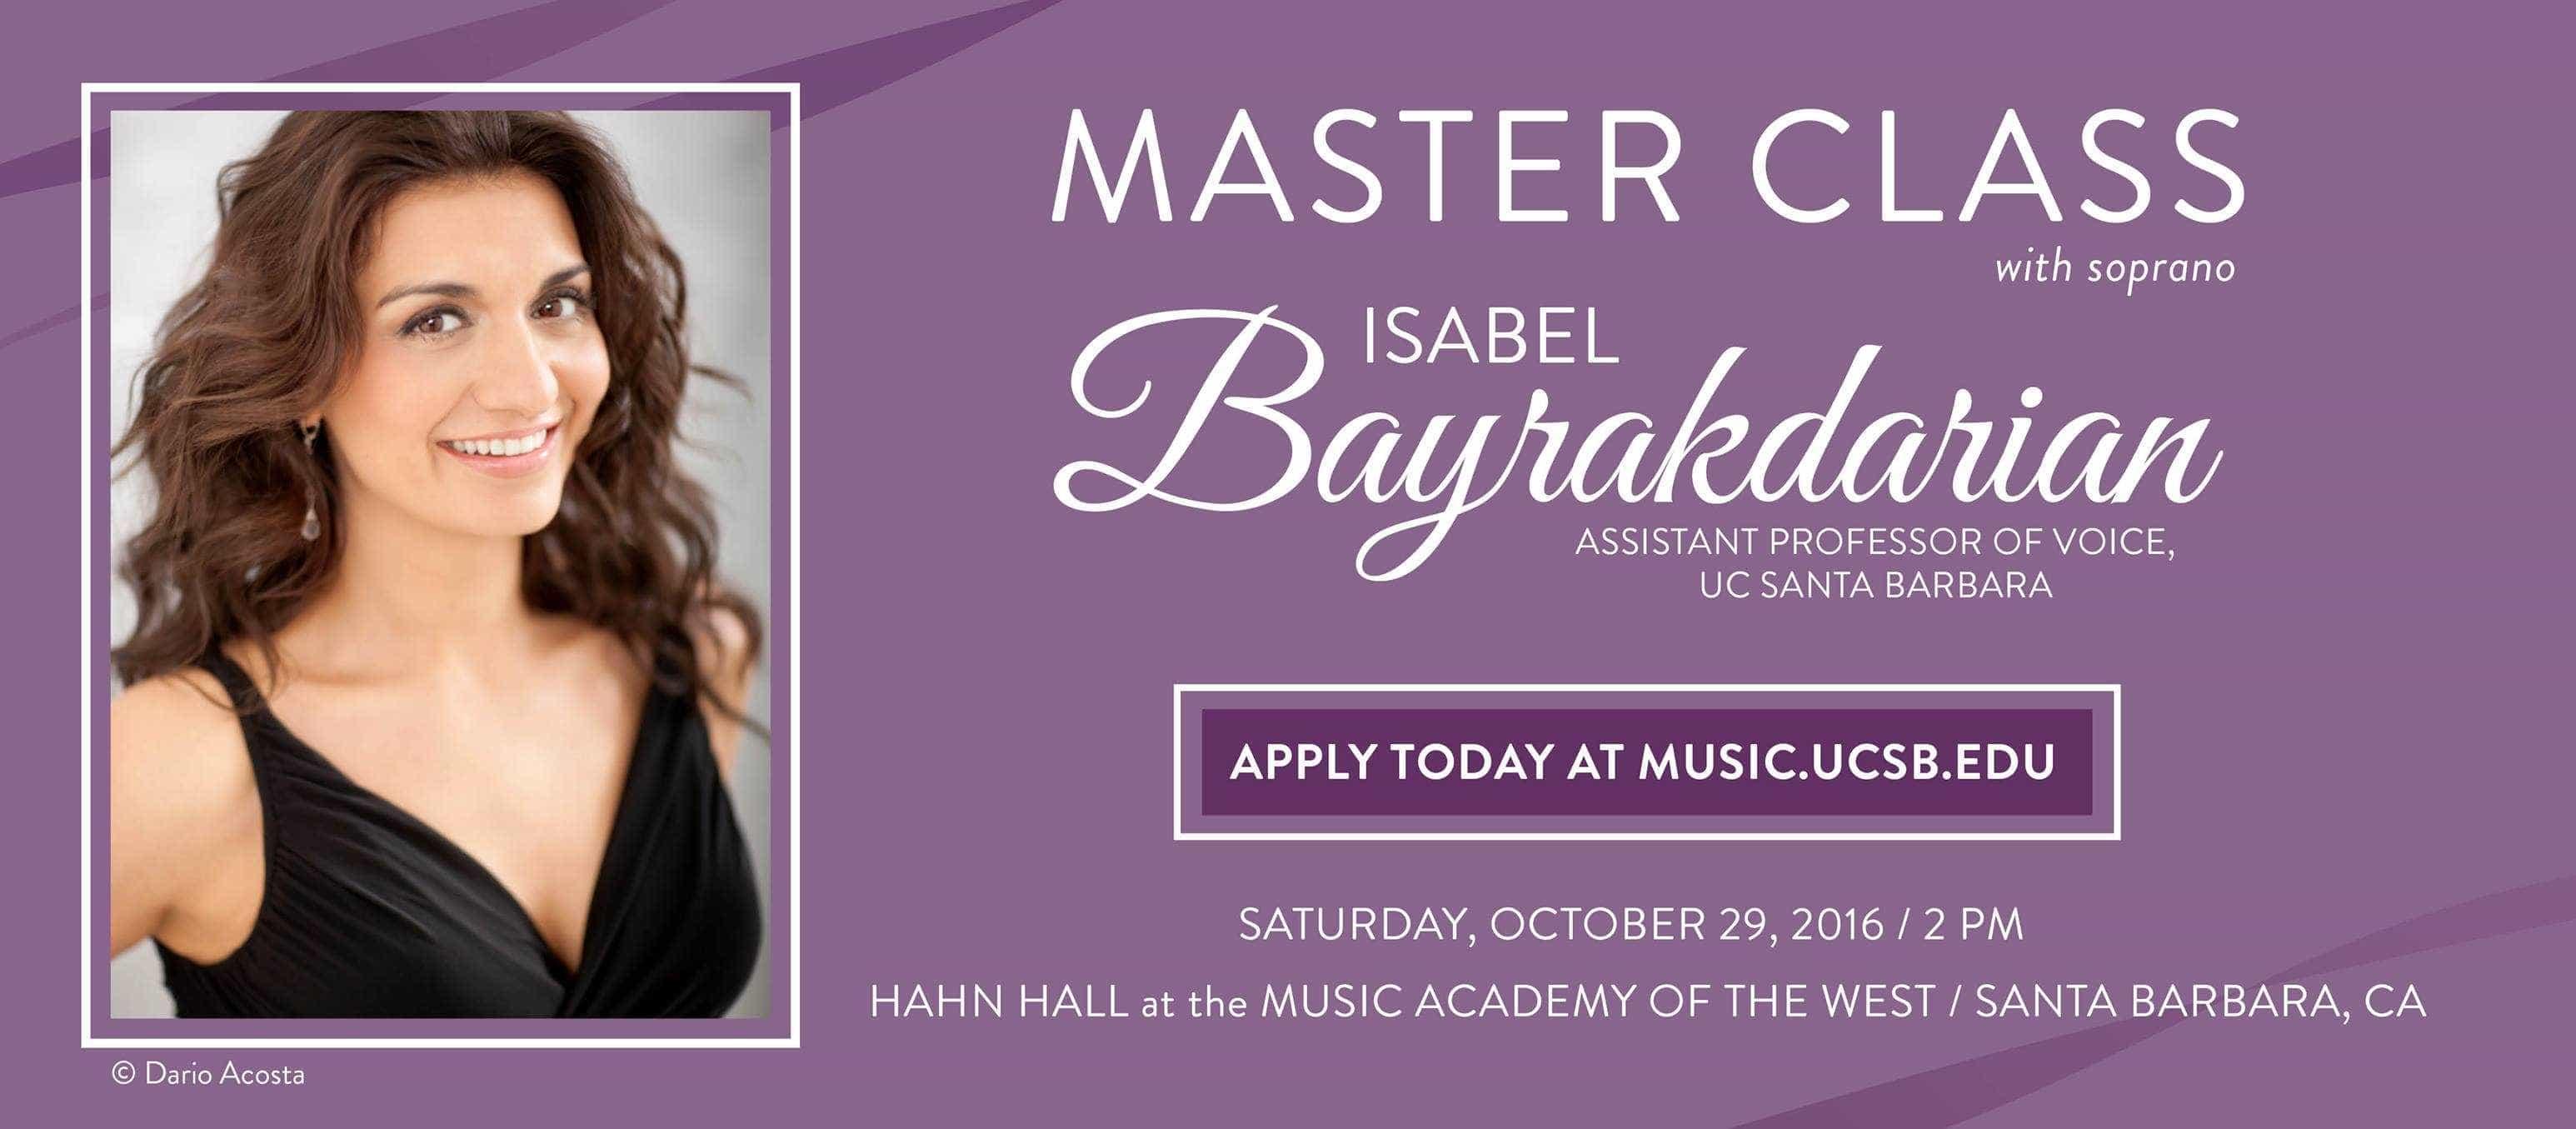 Isabel Bayrakdarian Masterclass